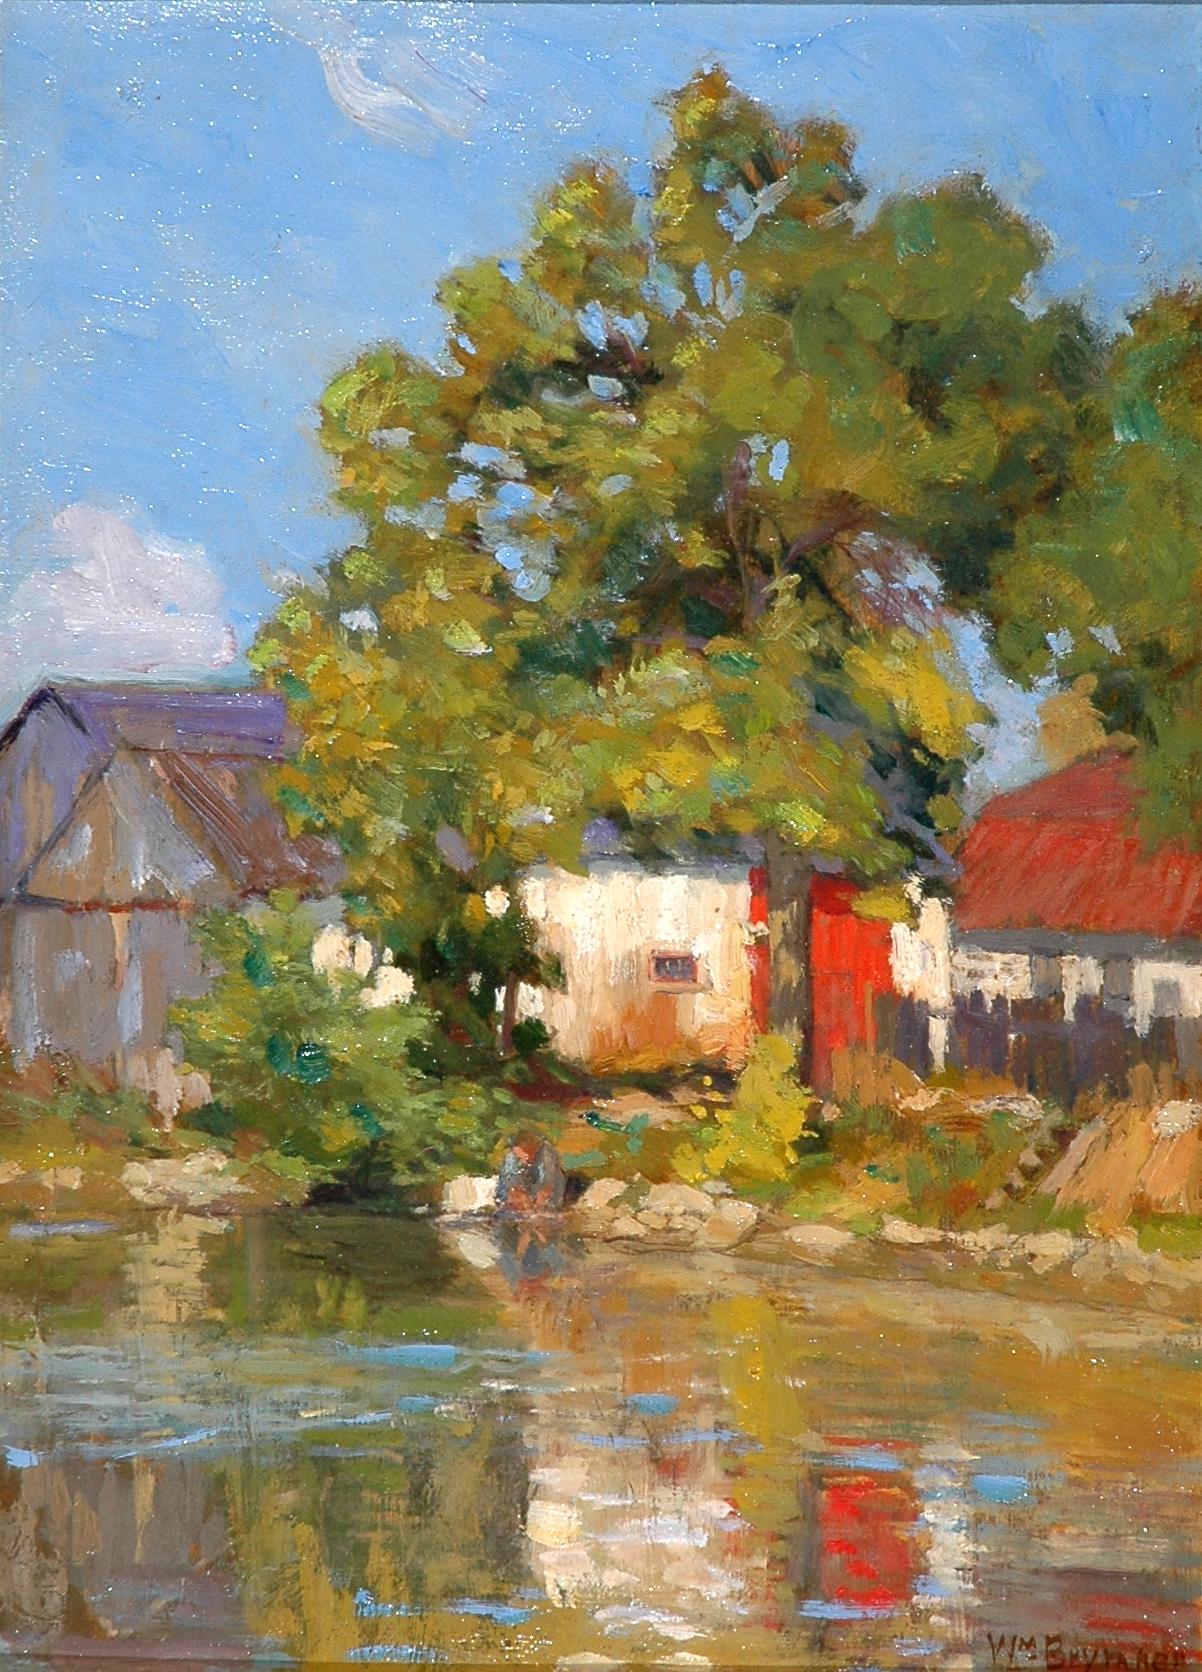 William Brymner Michel Bigu 233 Art Gallery